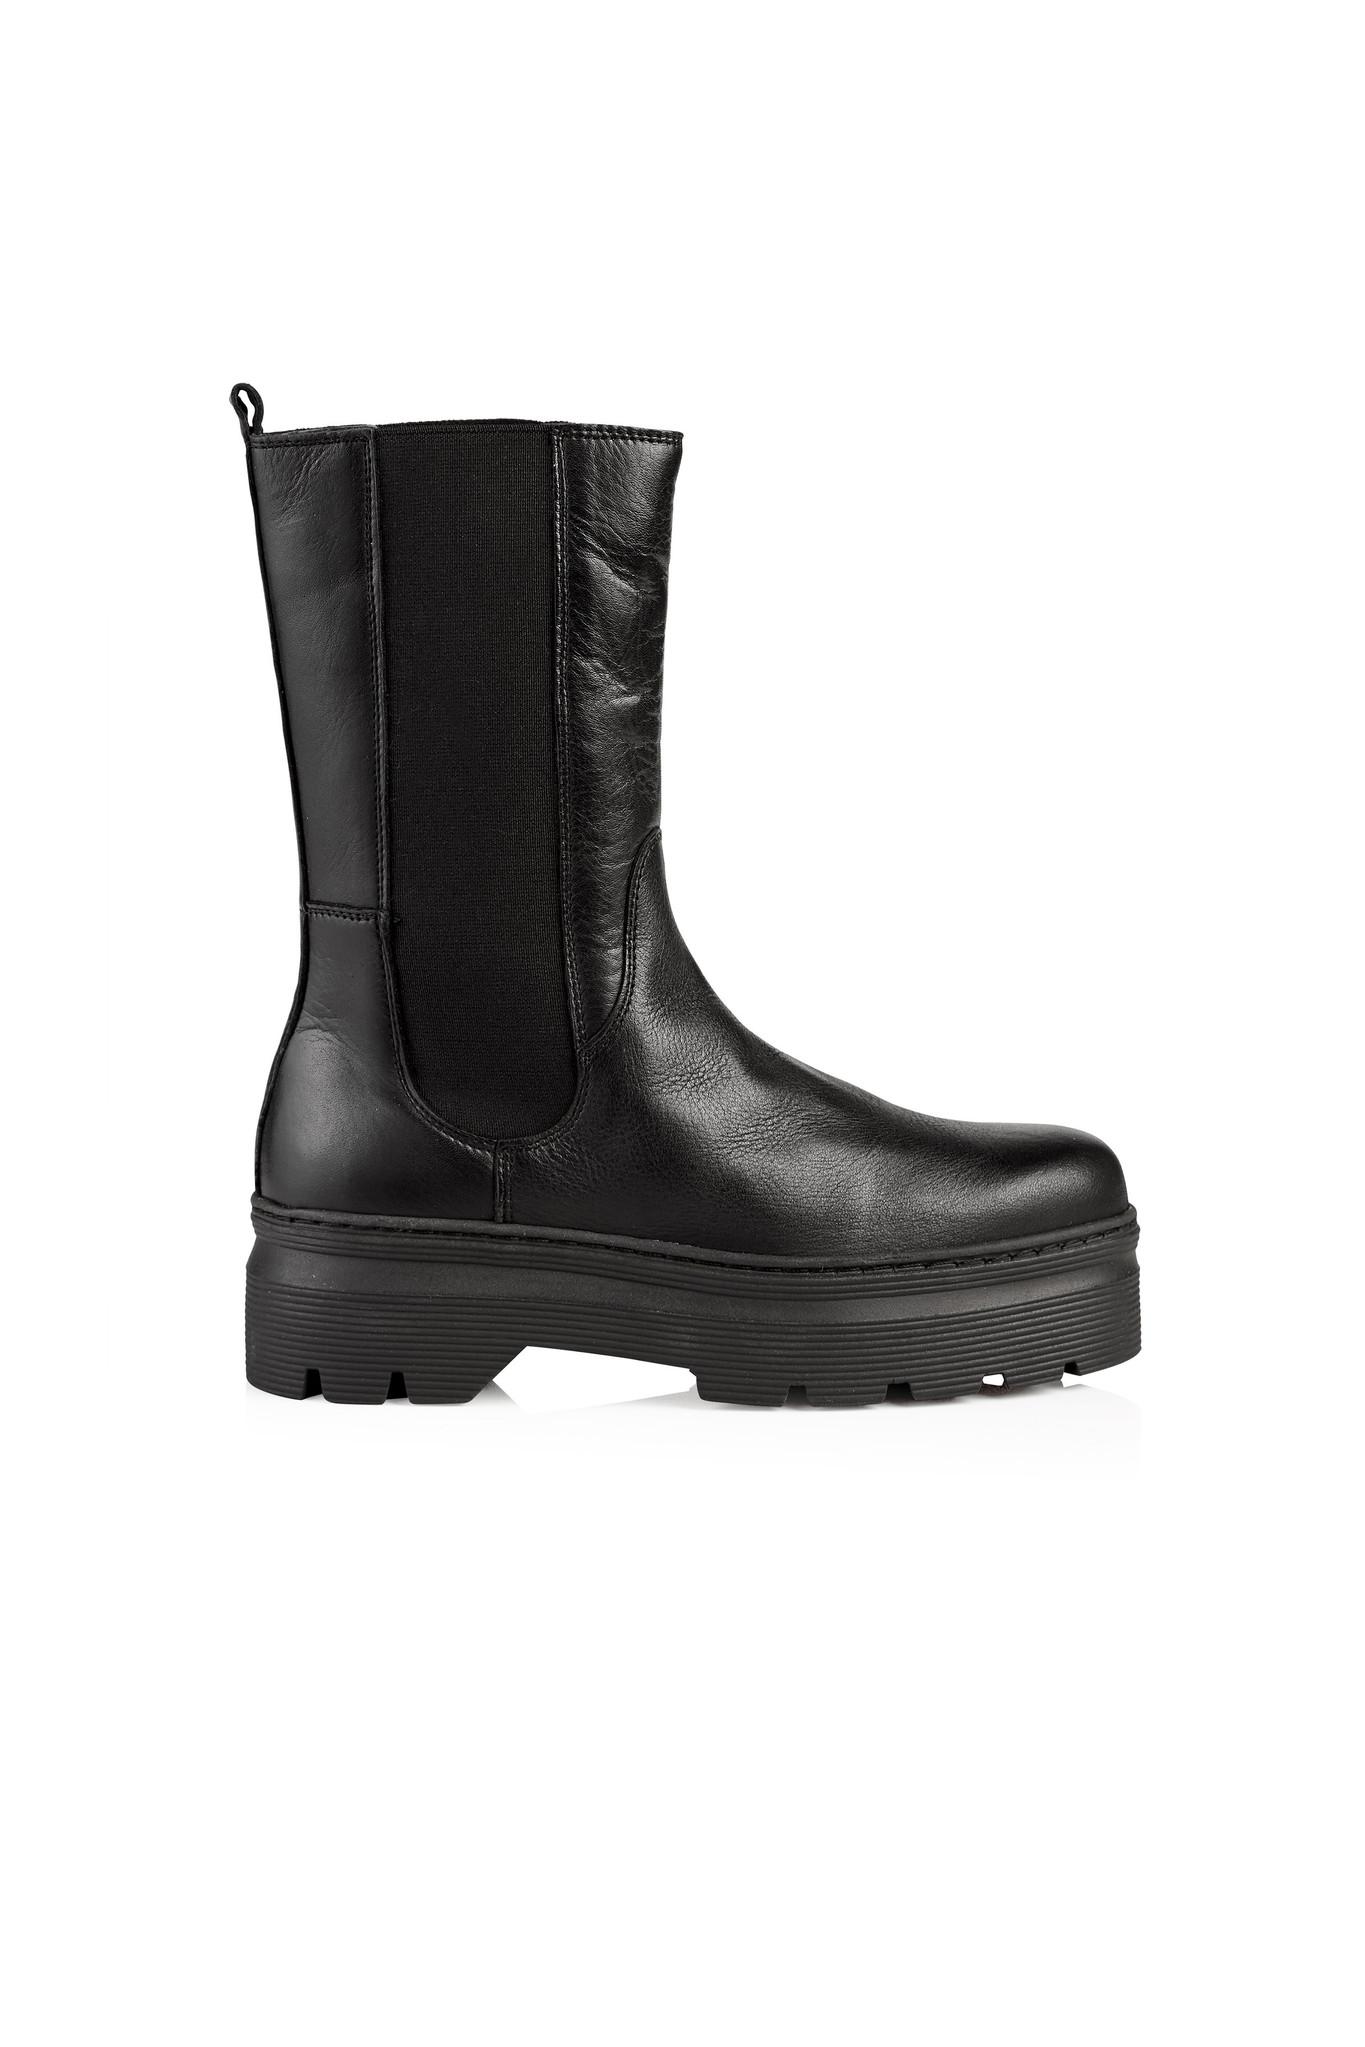 Aya Leather Boot - Black-1